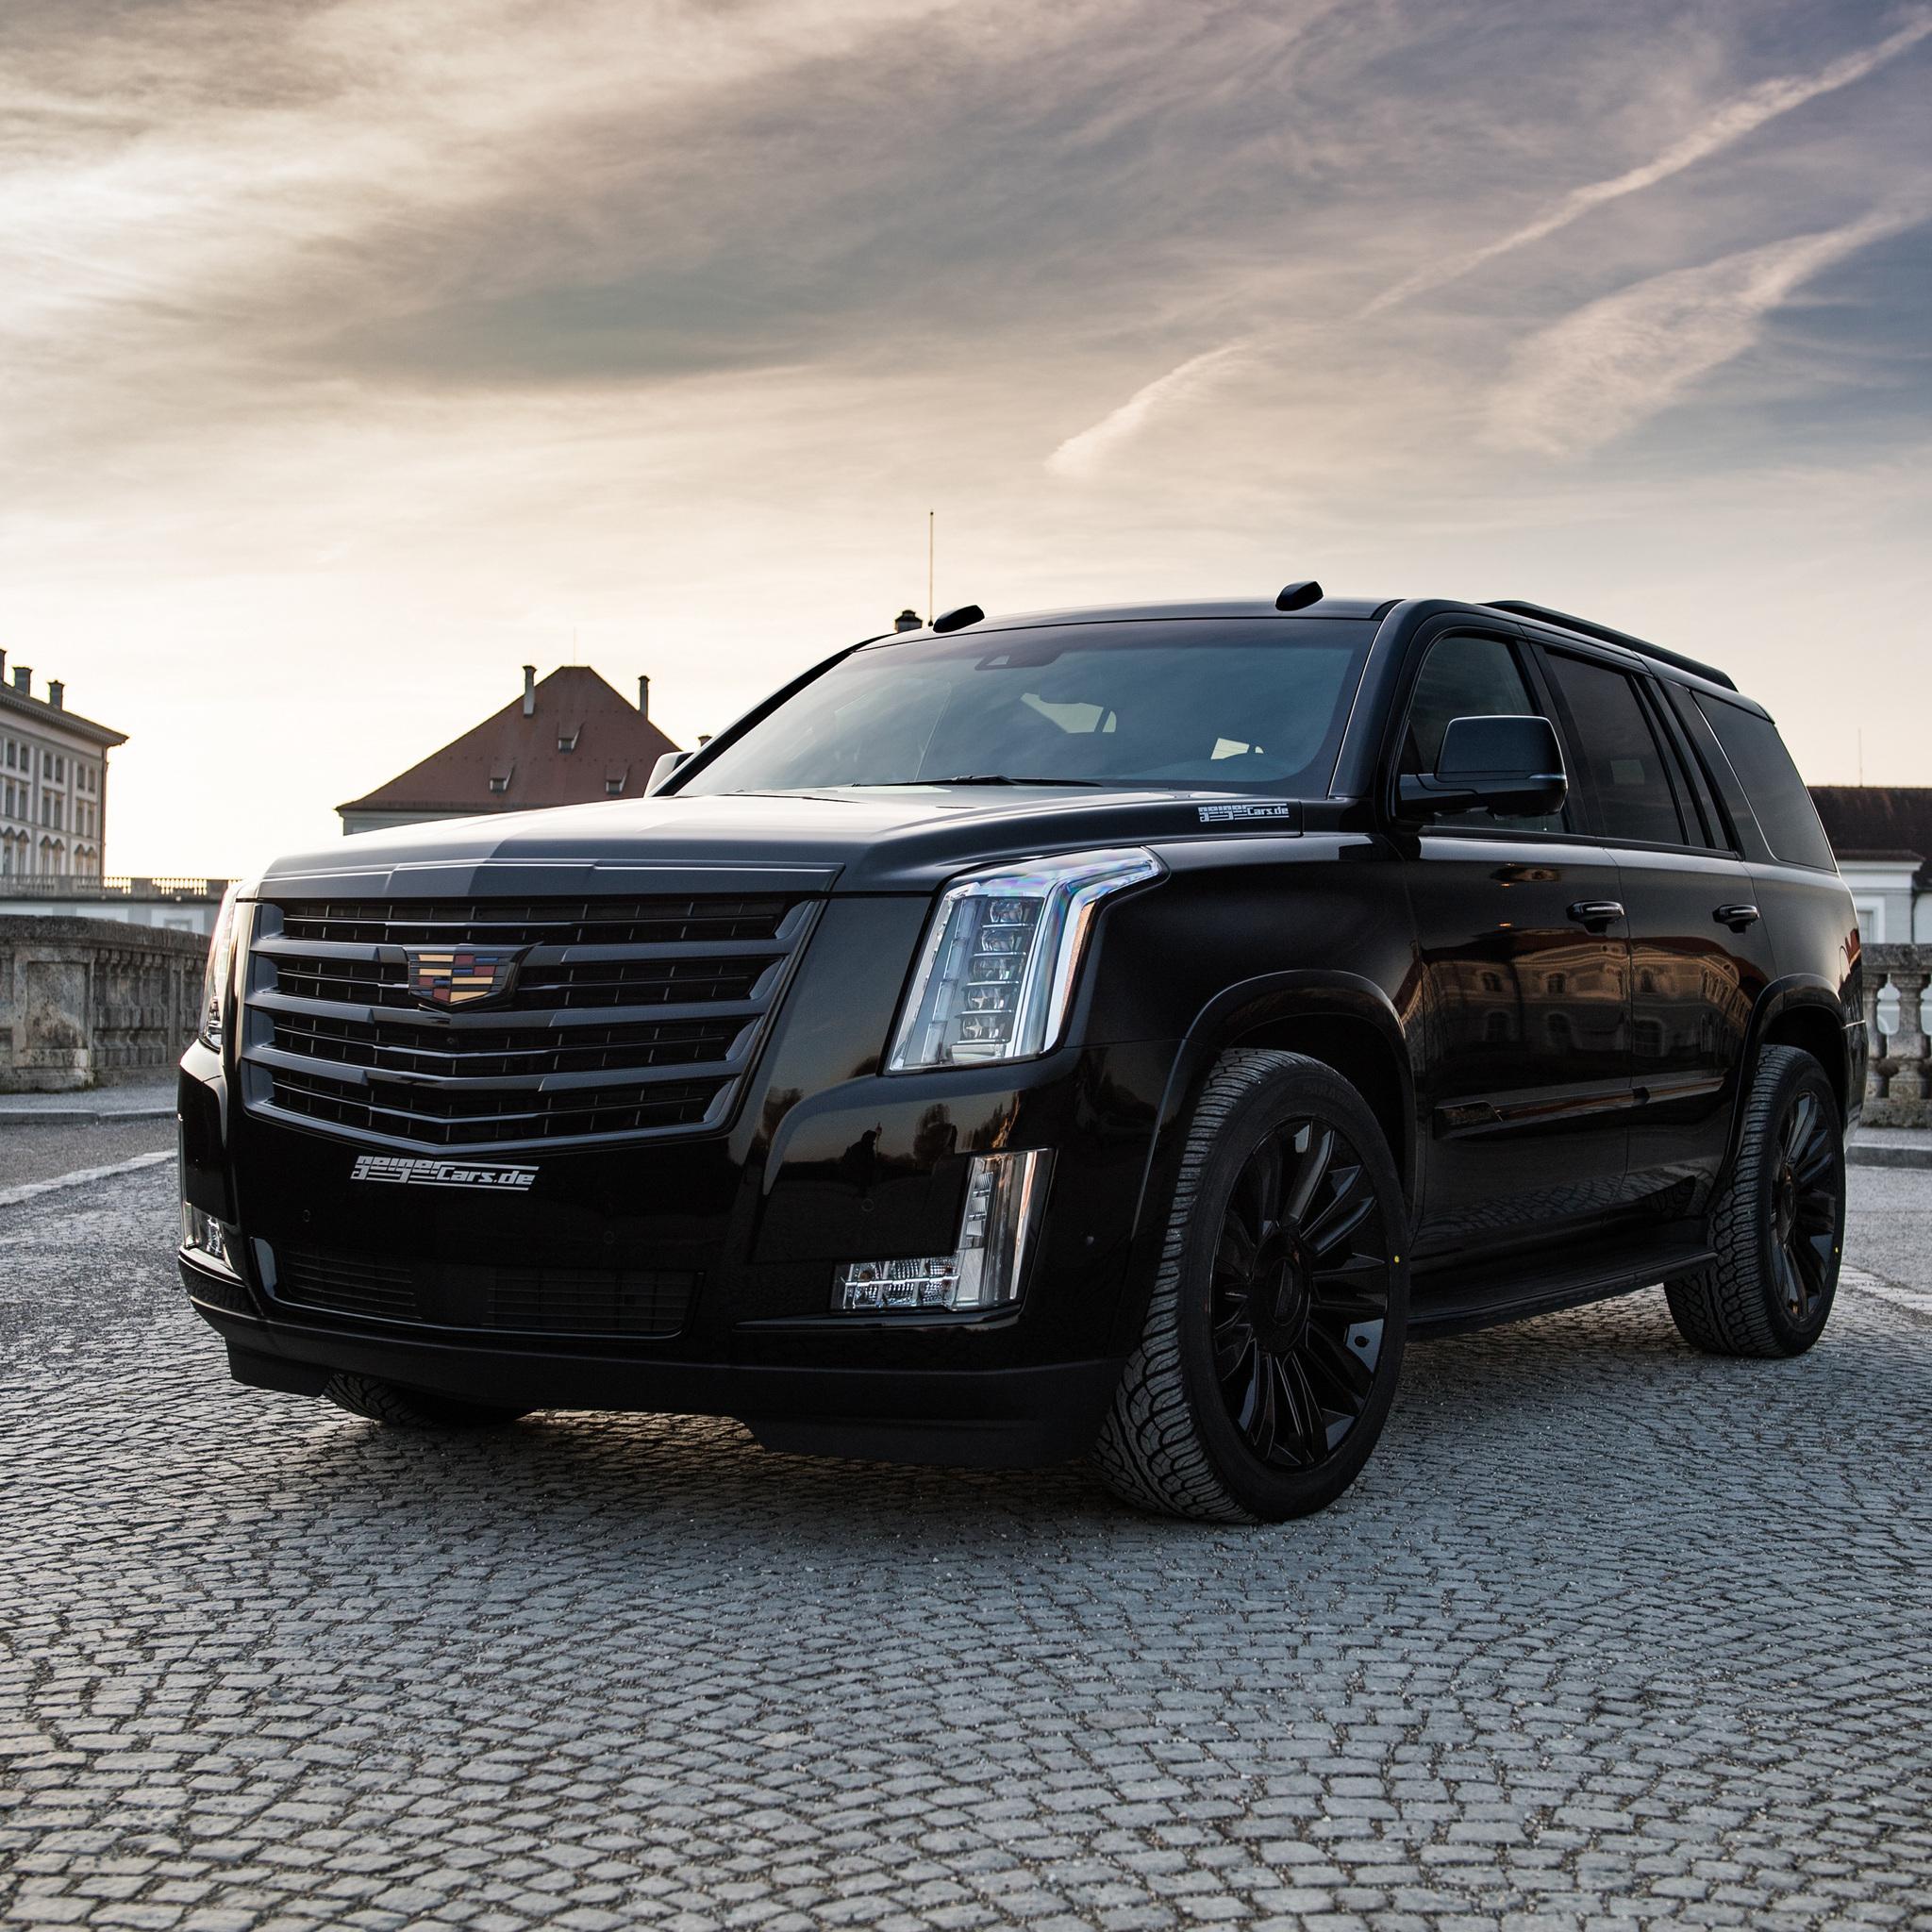 2048x2048 Geiger Cadillac Escalade Black Edition 2018 Ipad